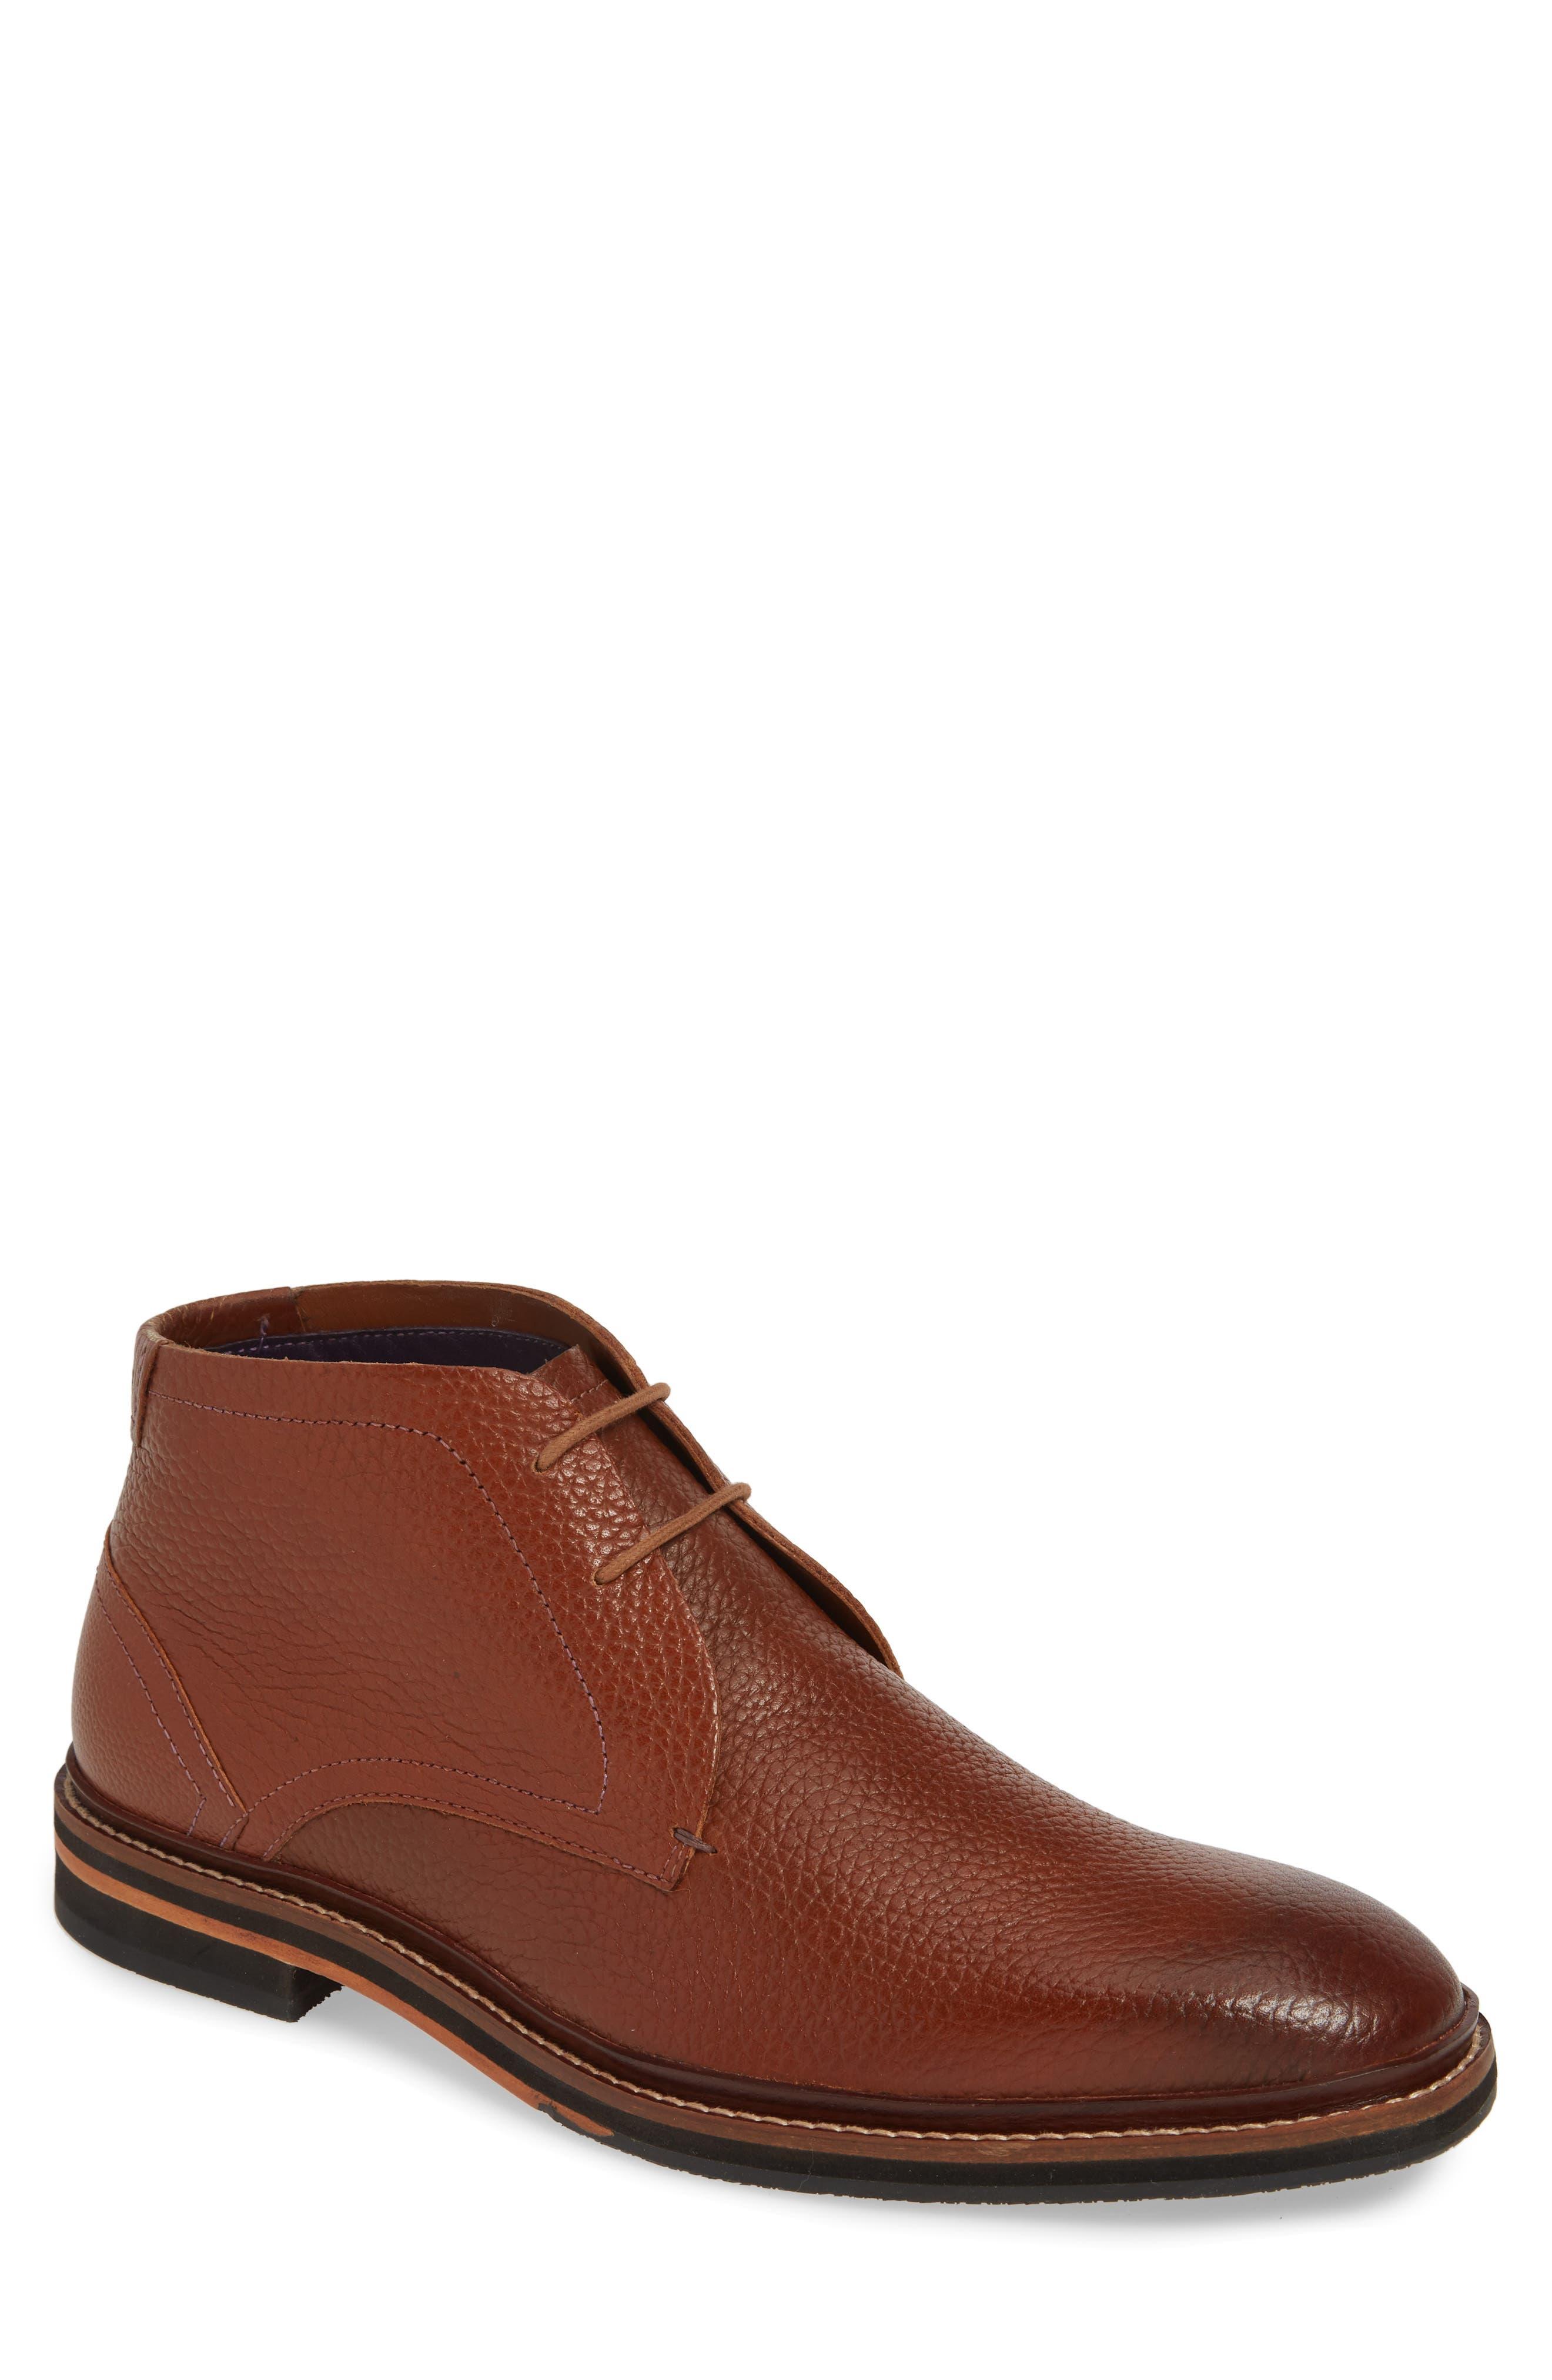 Ted Baker London Corans Chukka Boot, Brown